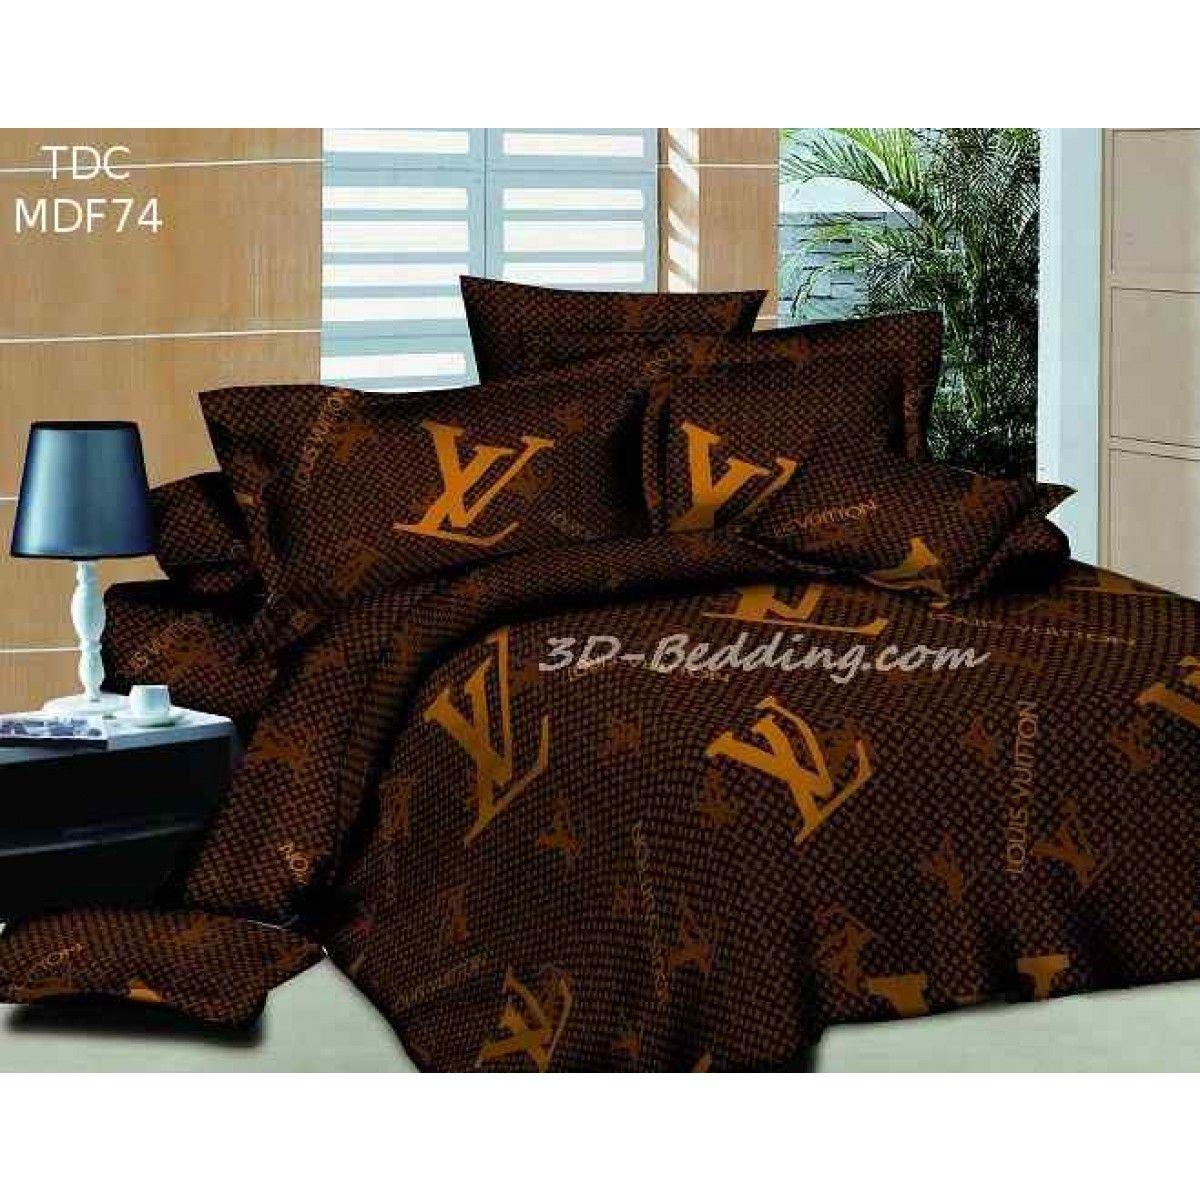 Louis Vuitton Bedding 3d Louis Vuitton Lv Design Bedding Set 4pcs Queen Set Egyptian Bedding Sets Bedding Set Modern Bedroom Set